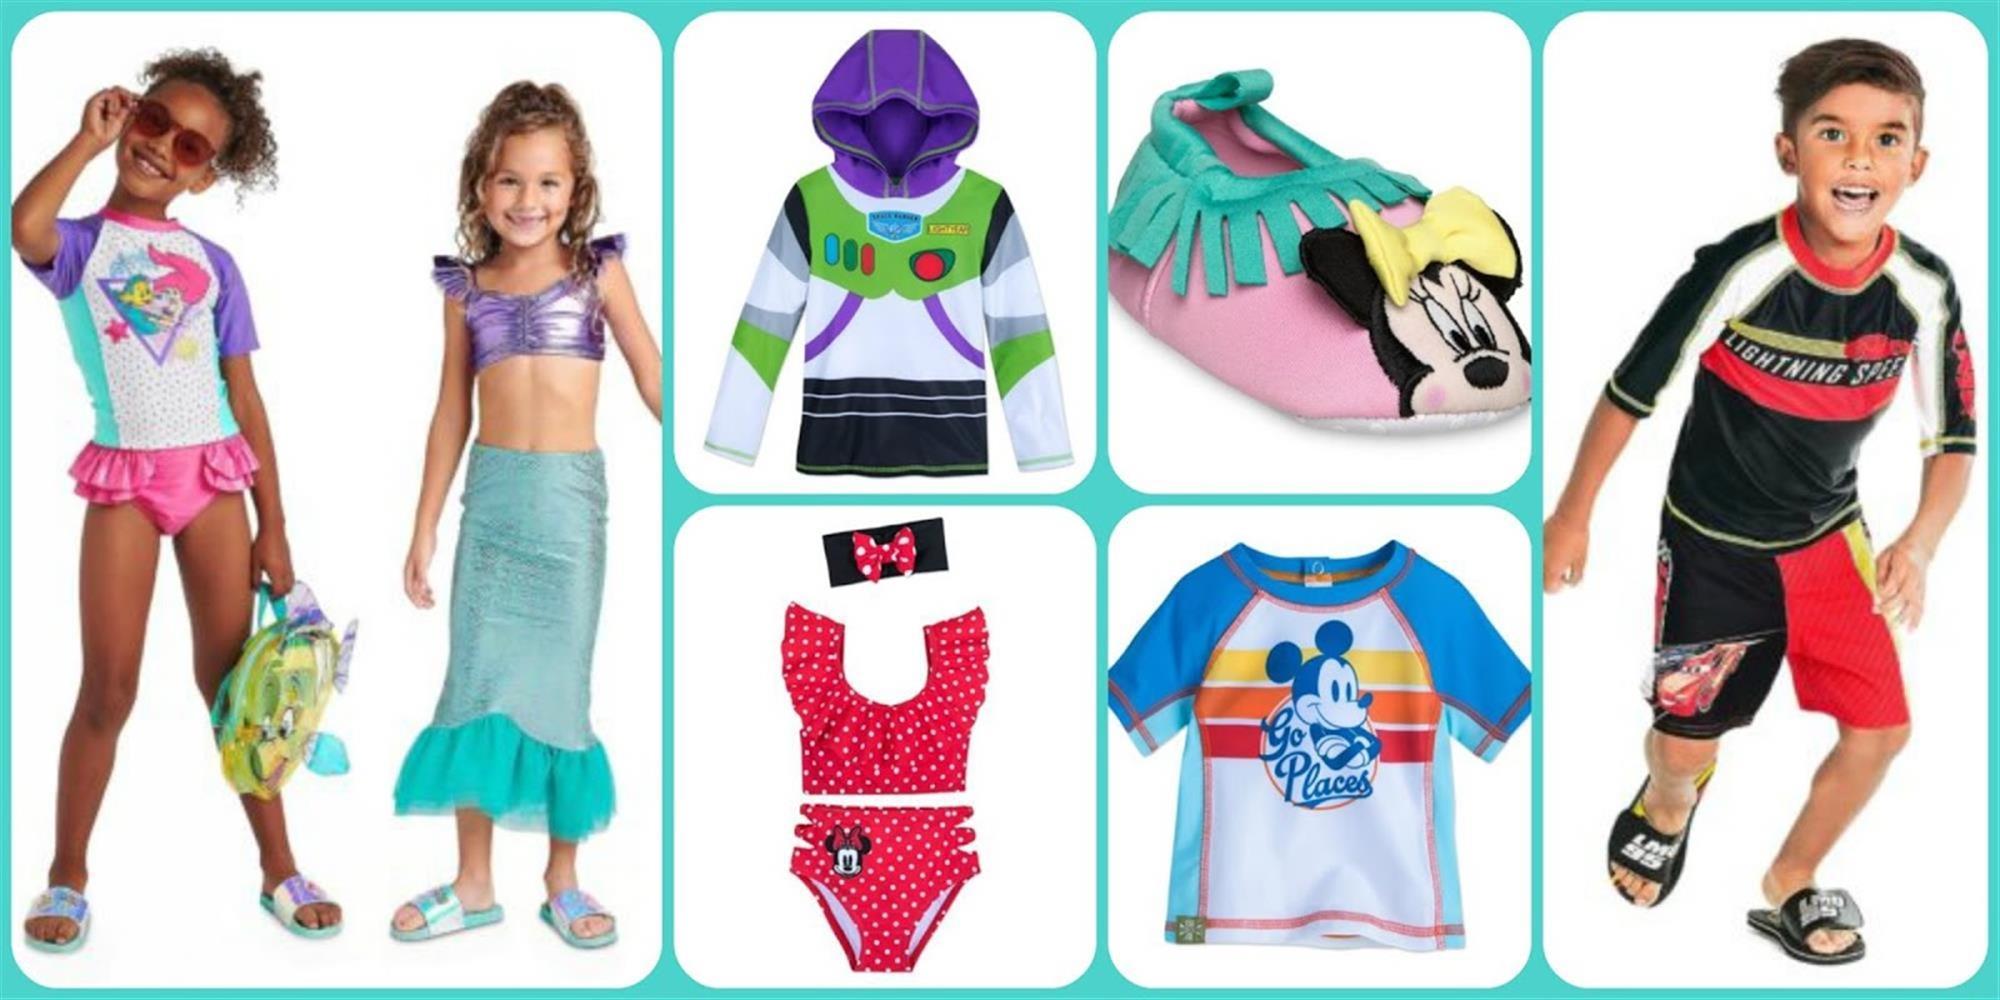 Disney Roxy Girl Capsule Collection Celebrates 30th